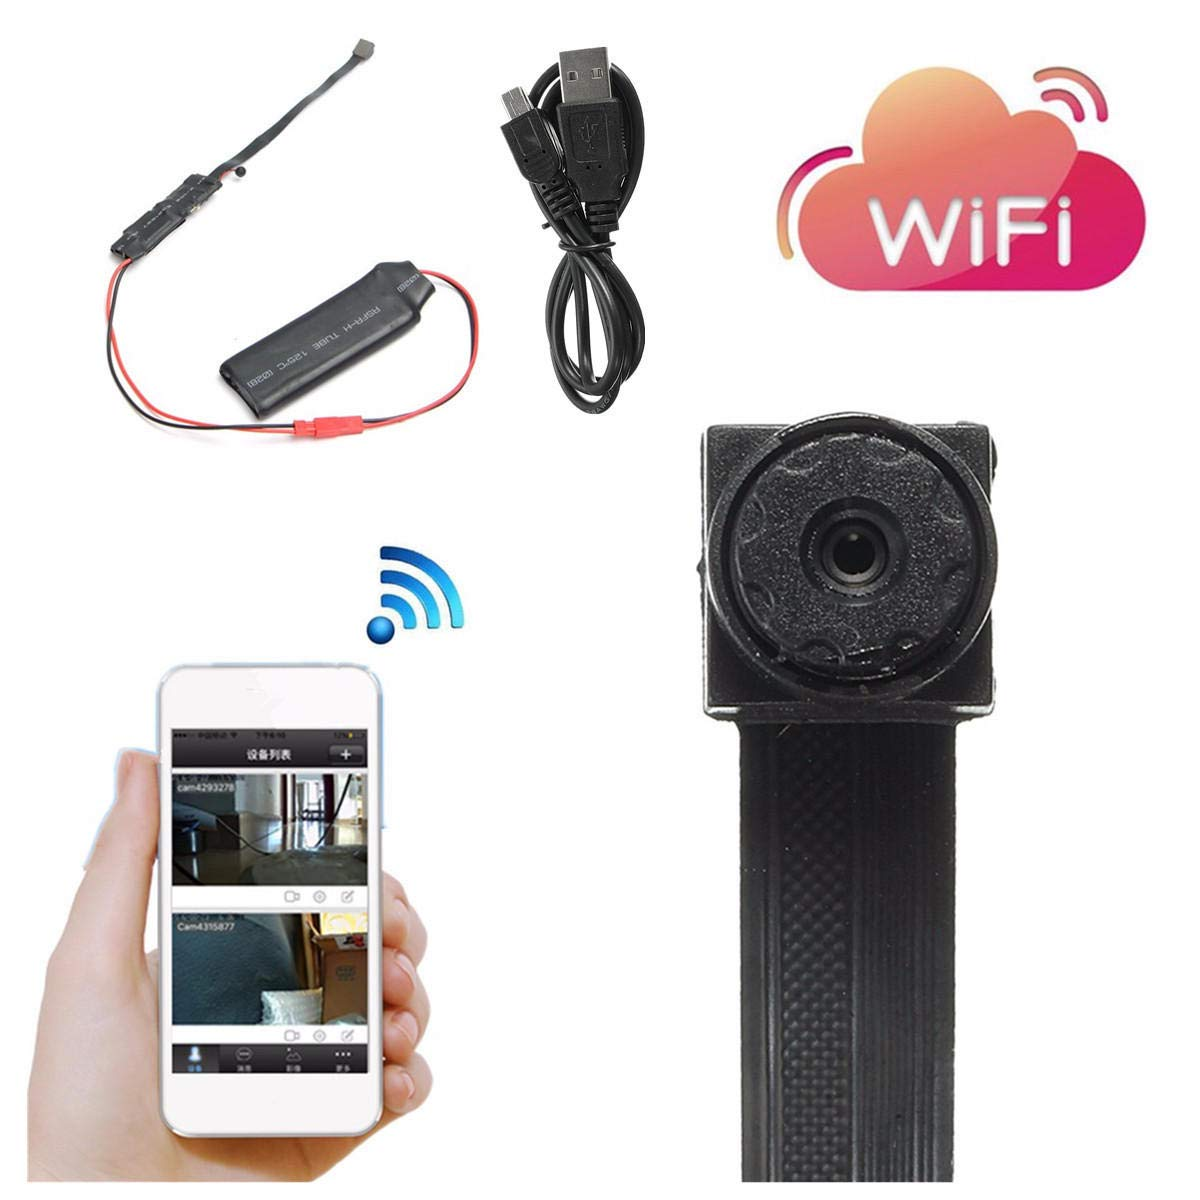 mini wifi module camera cctv ip wireless surveillance camera for android  ios - security cameras camera module - 1 x mini camera 1 x usb cable 1 x  english